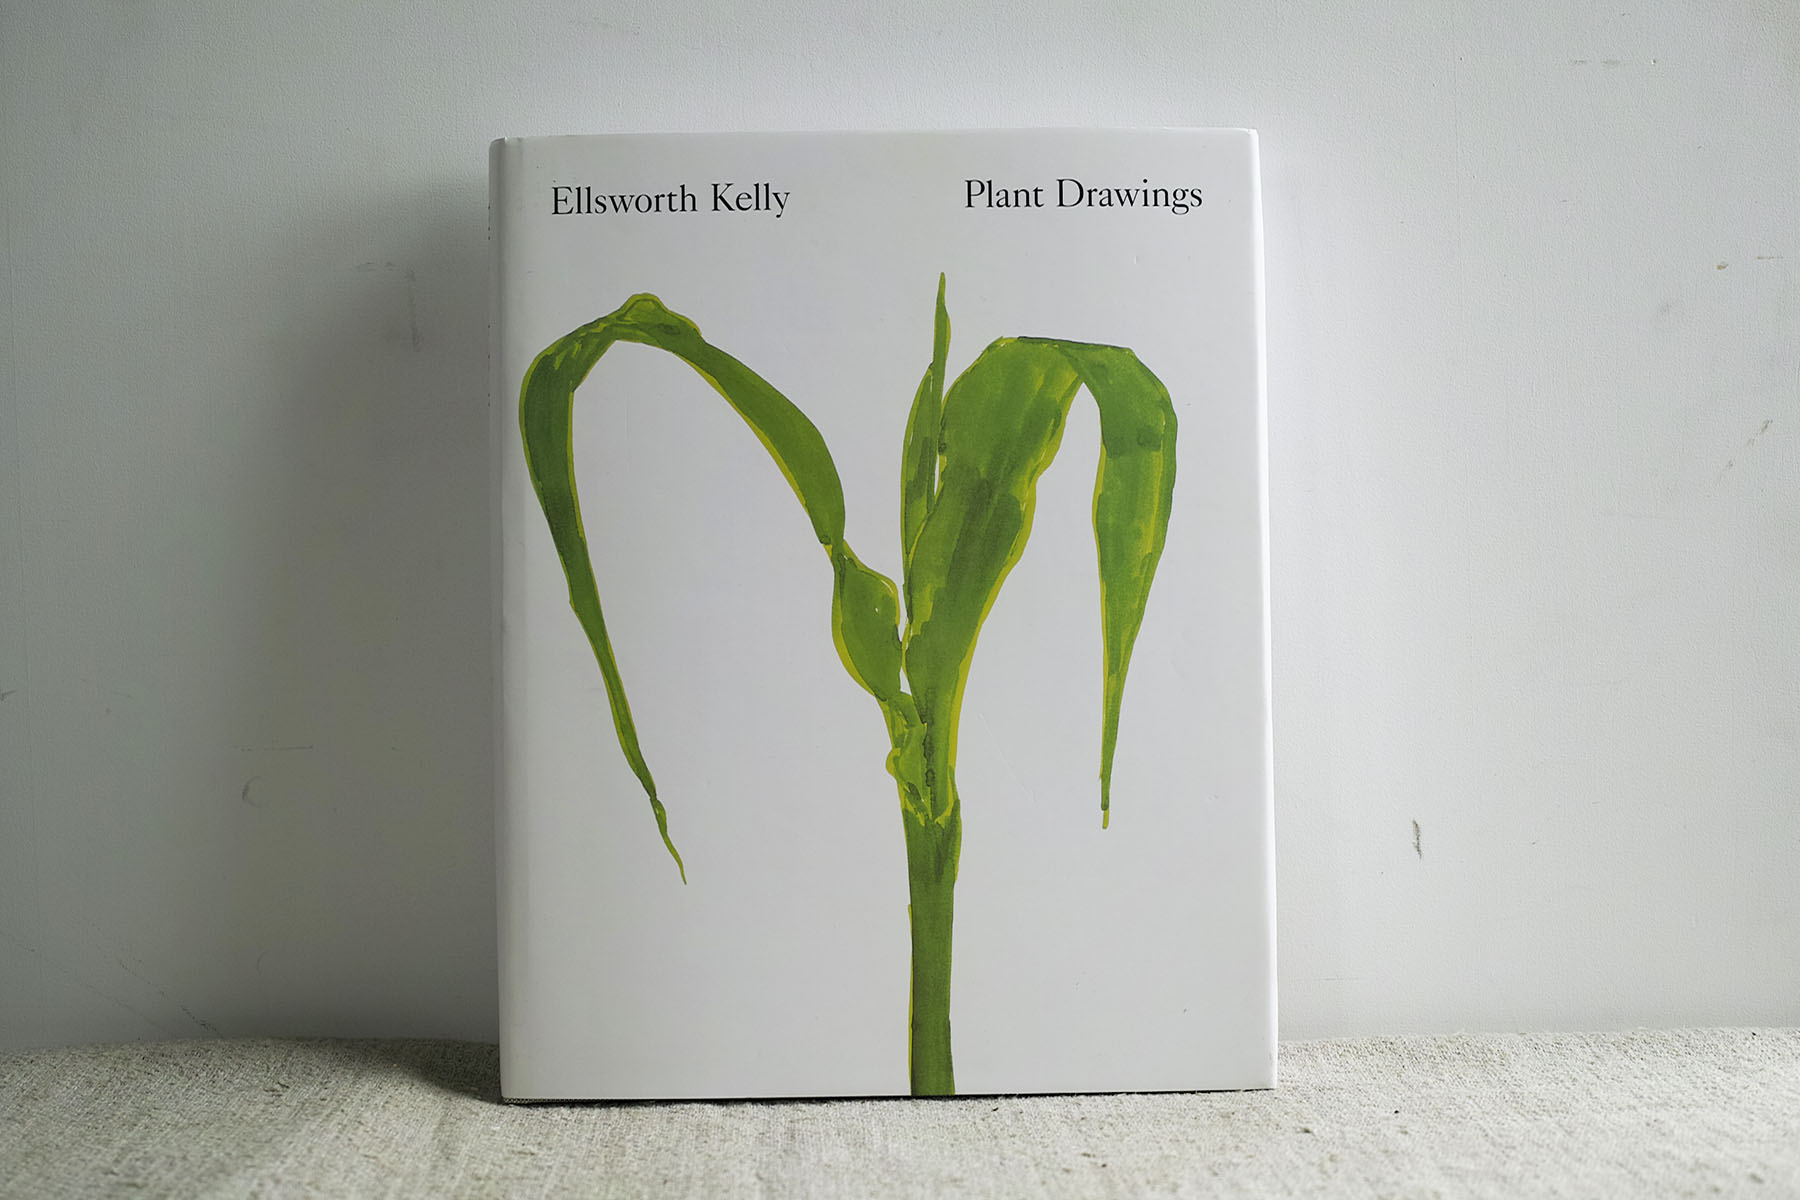 ek_plant_d_1.jpg